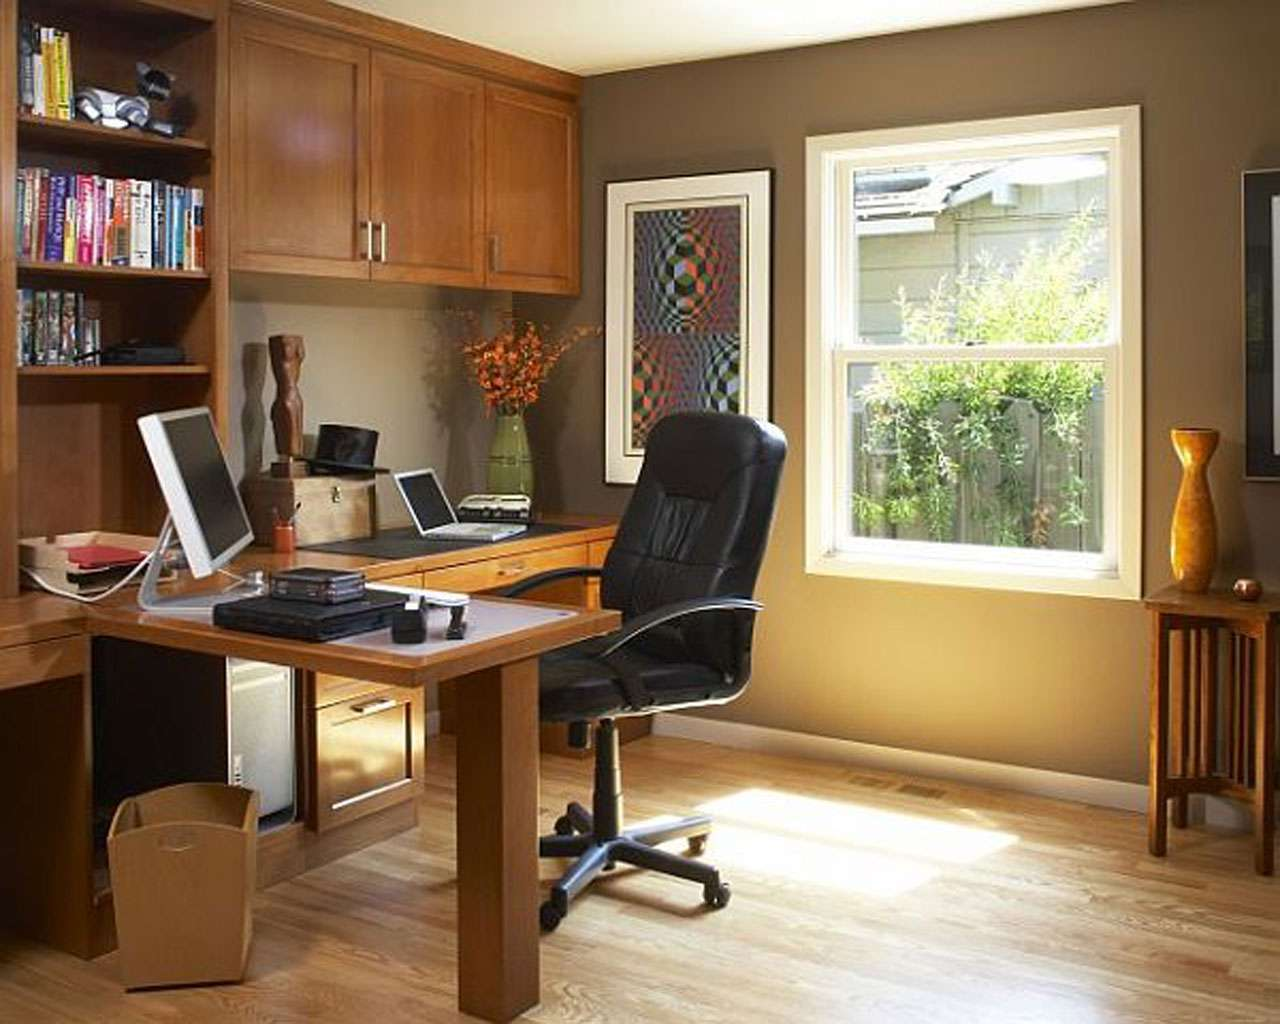 Home Office Ideas Modern House Plans